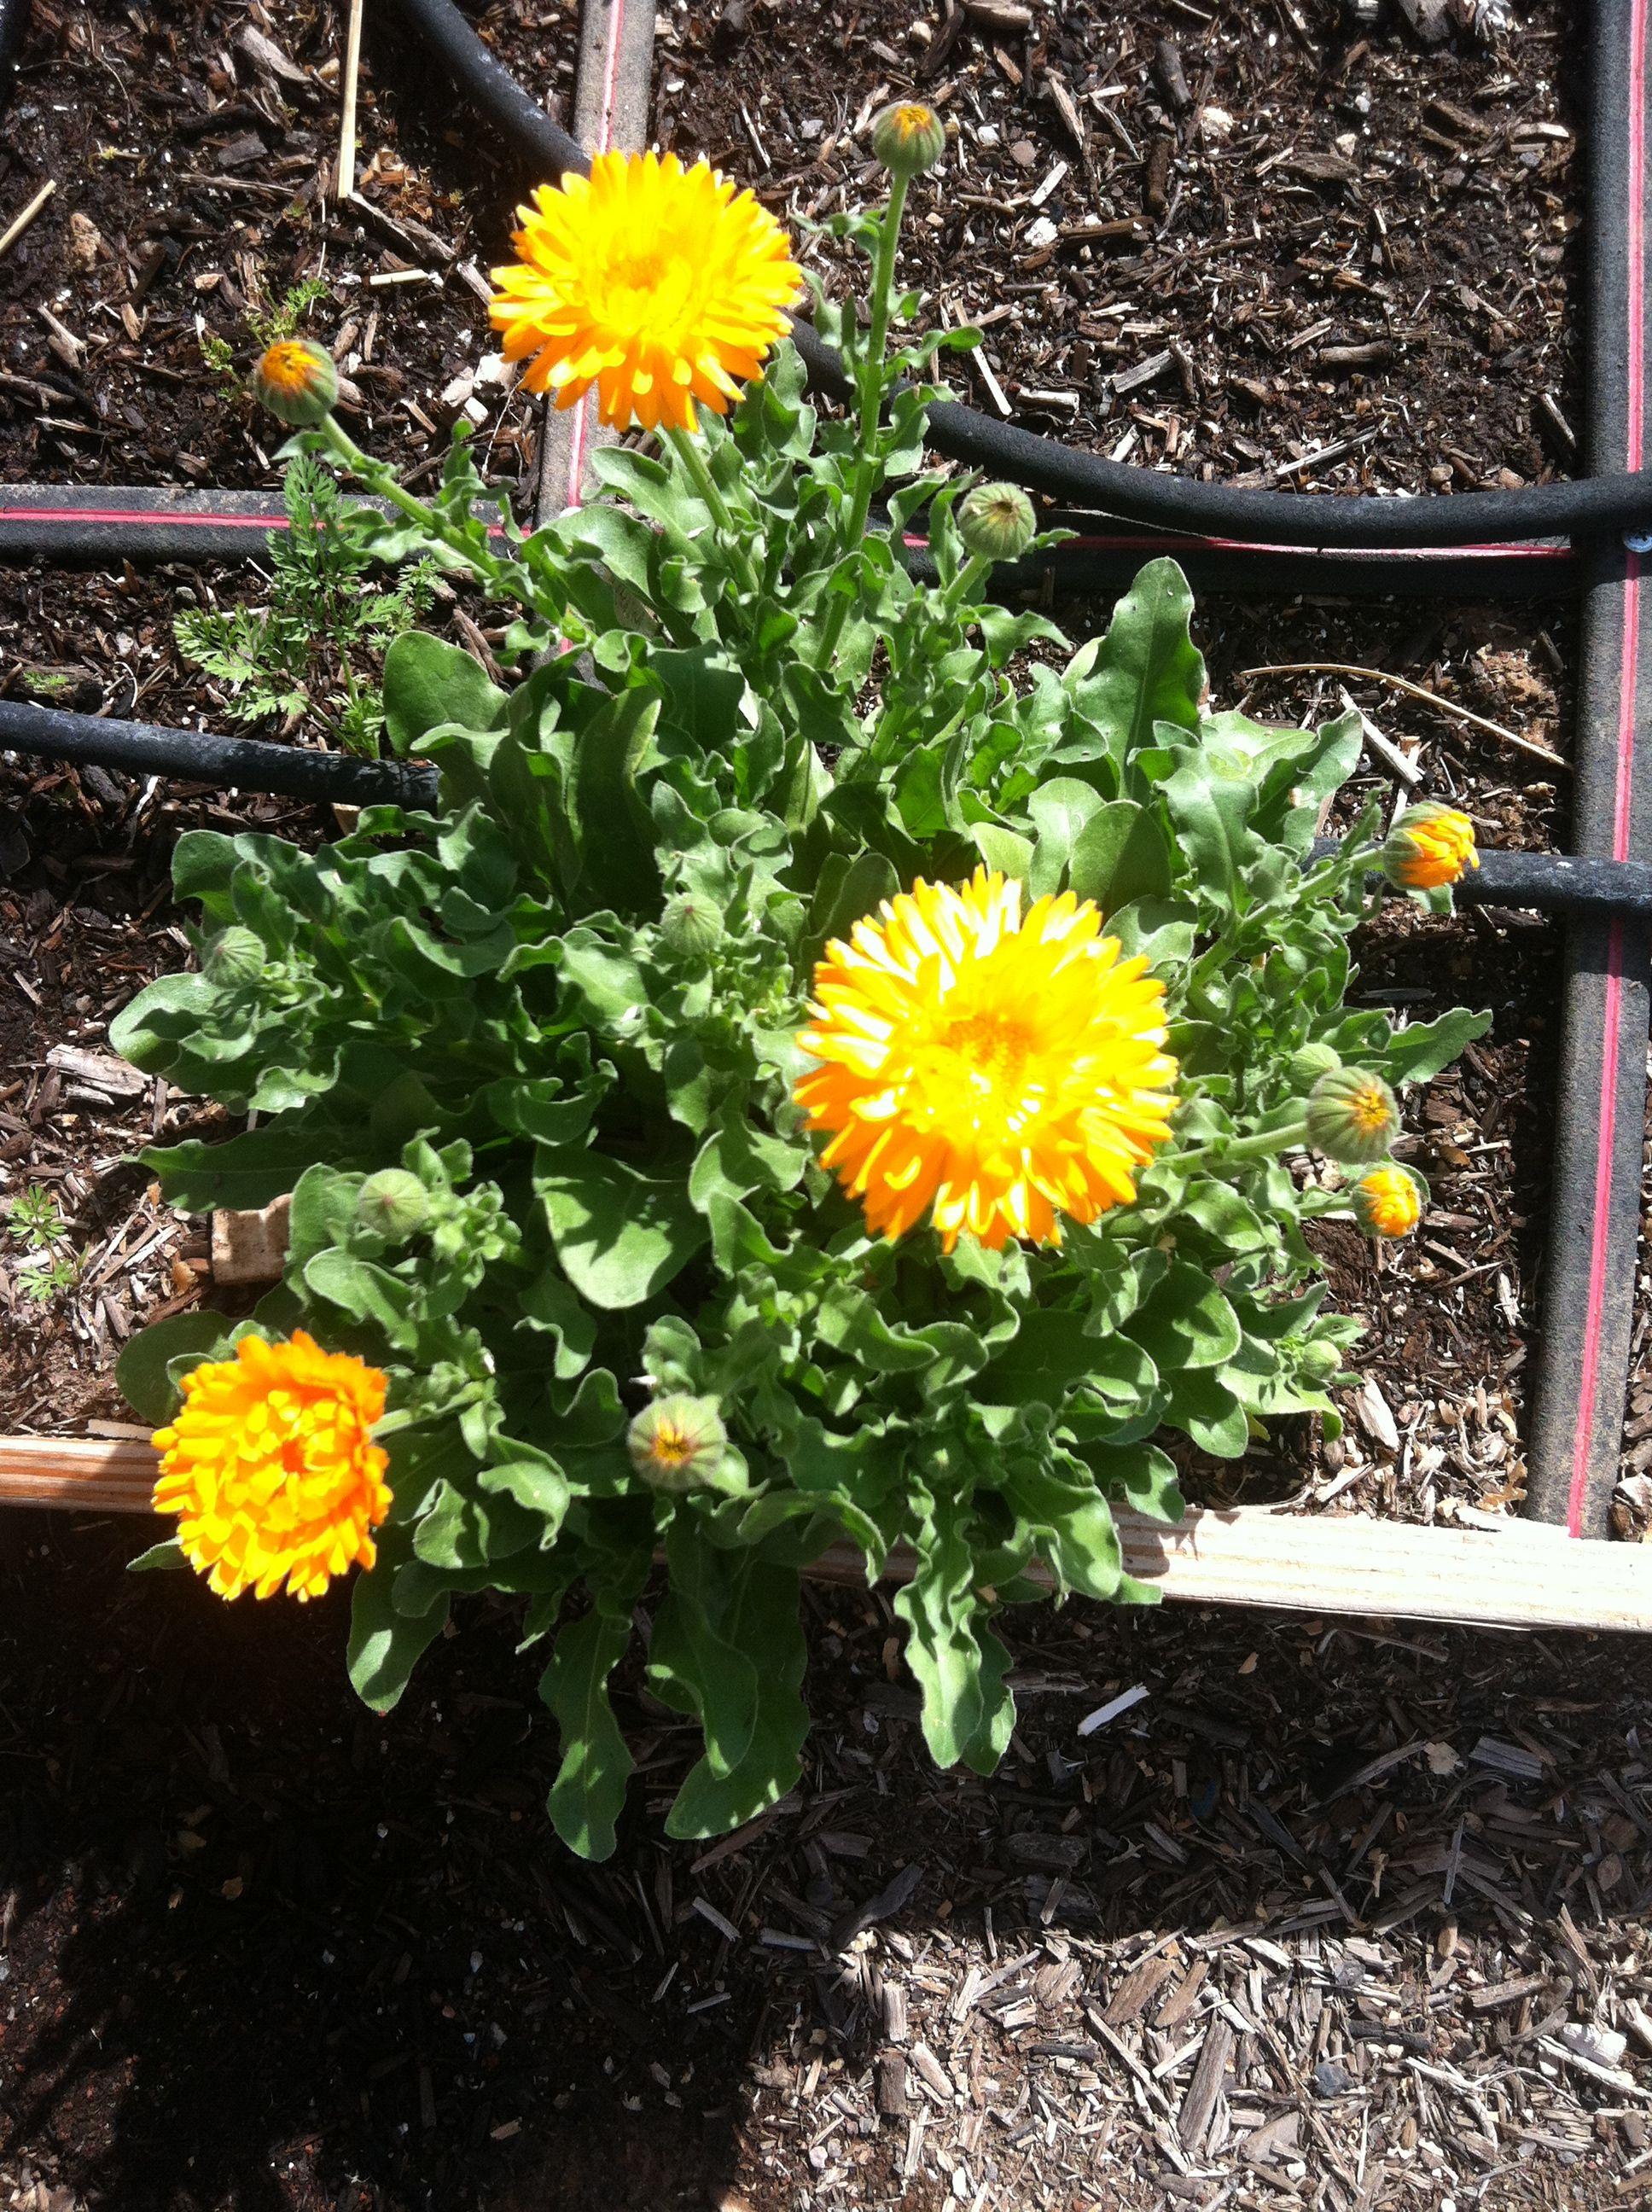 Pin on Flowers / Gardening